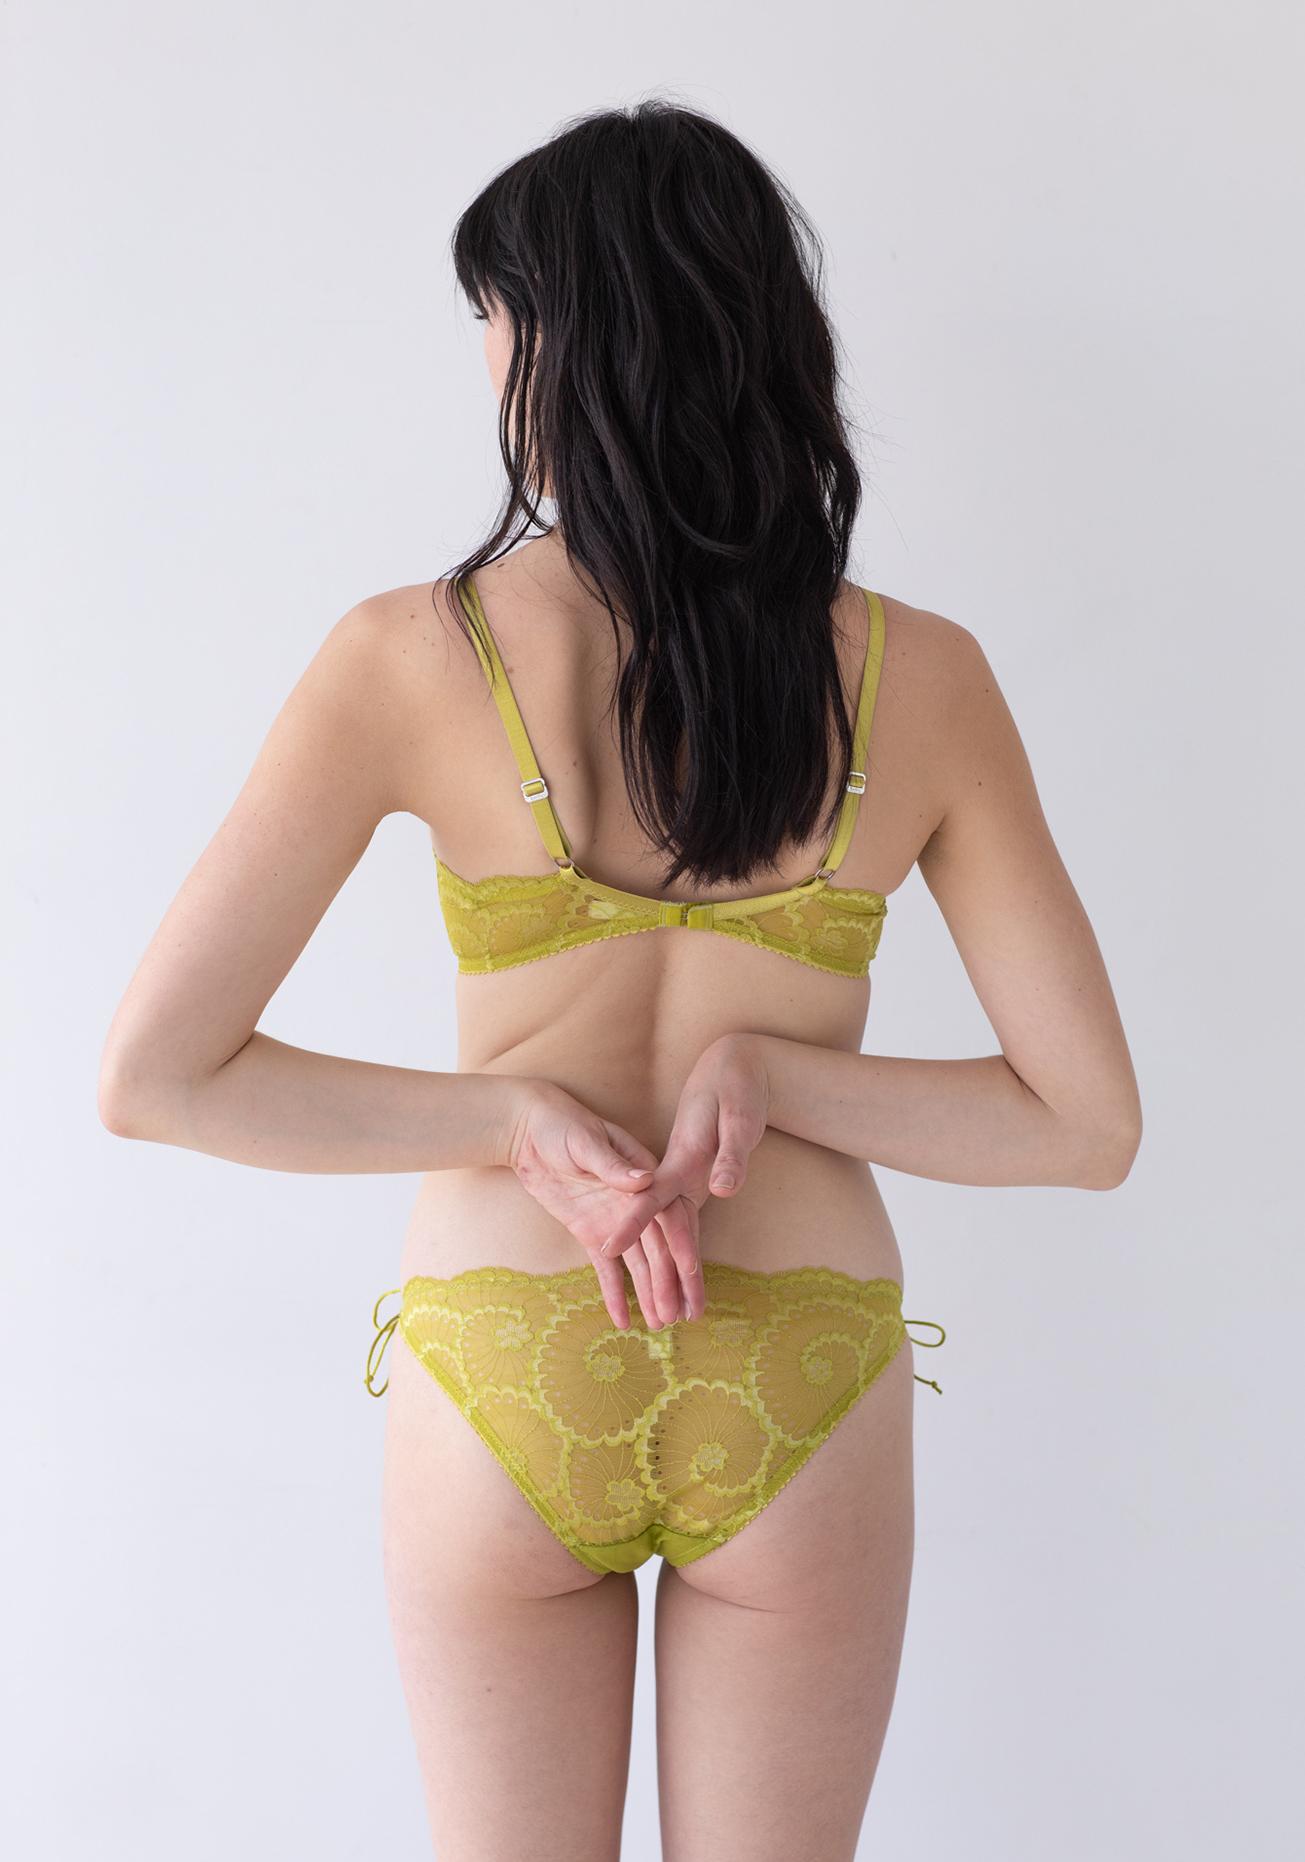 australian bridal underwear lingerie designer